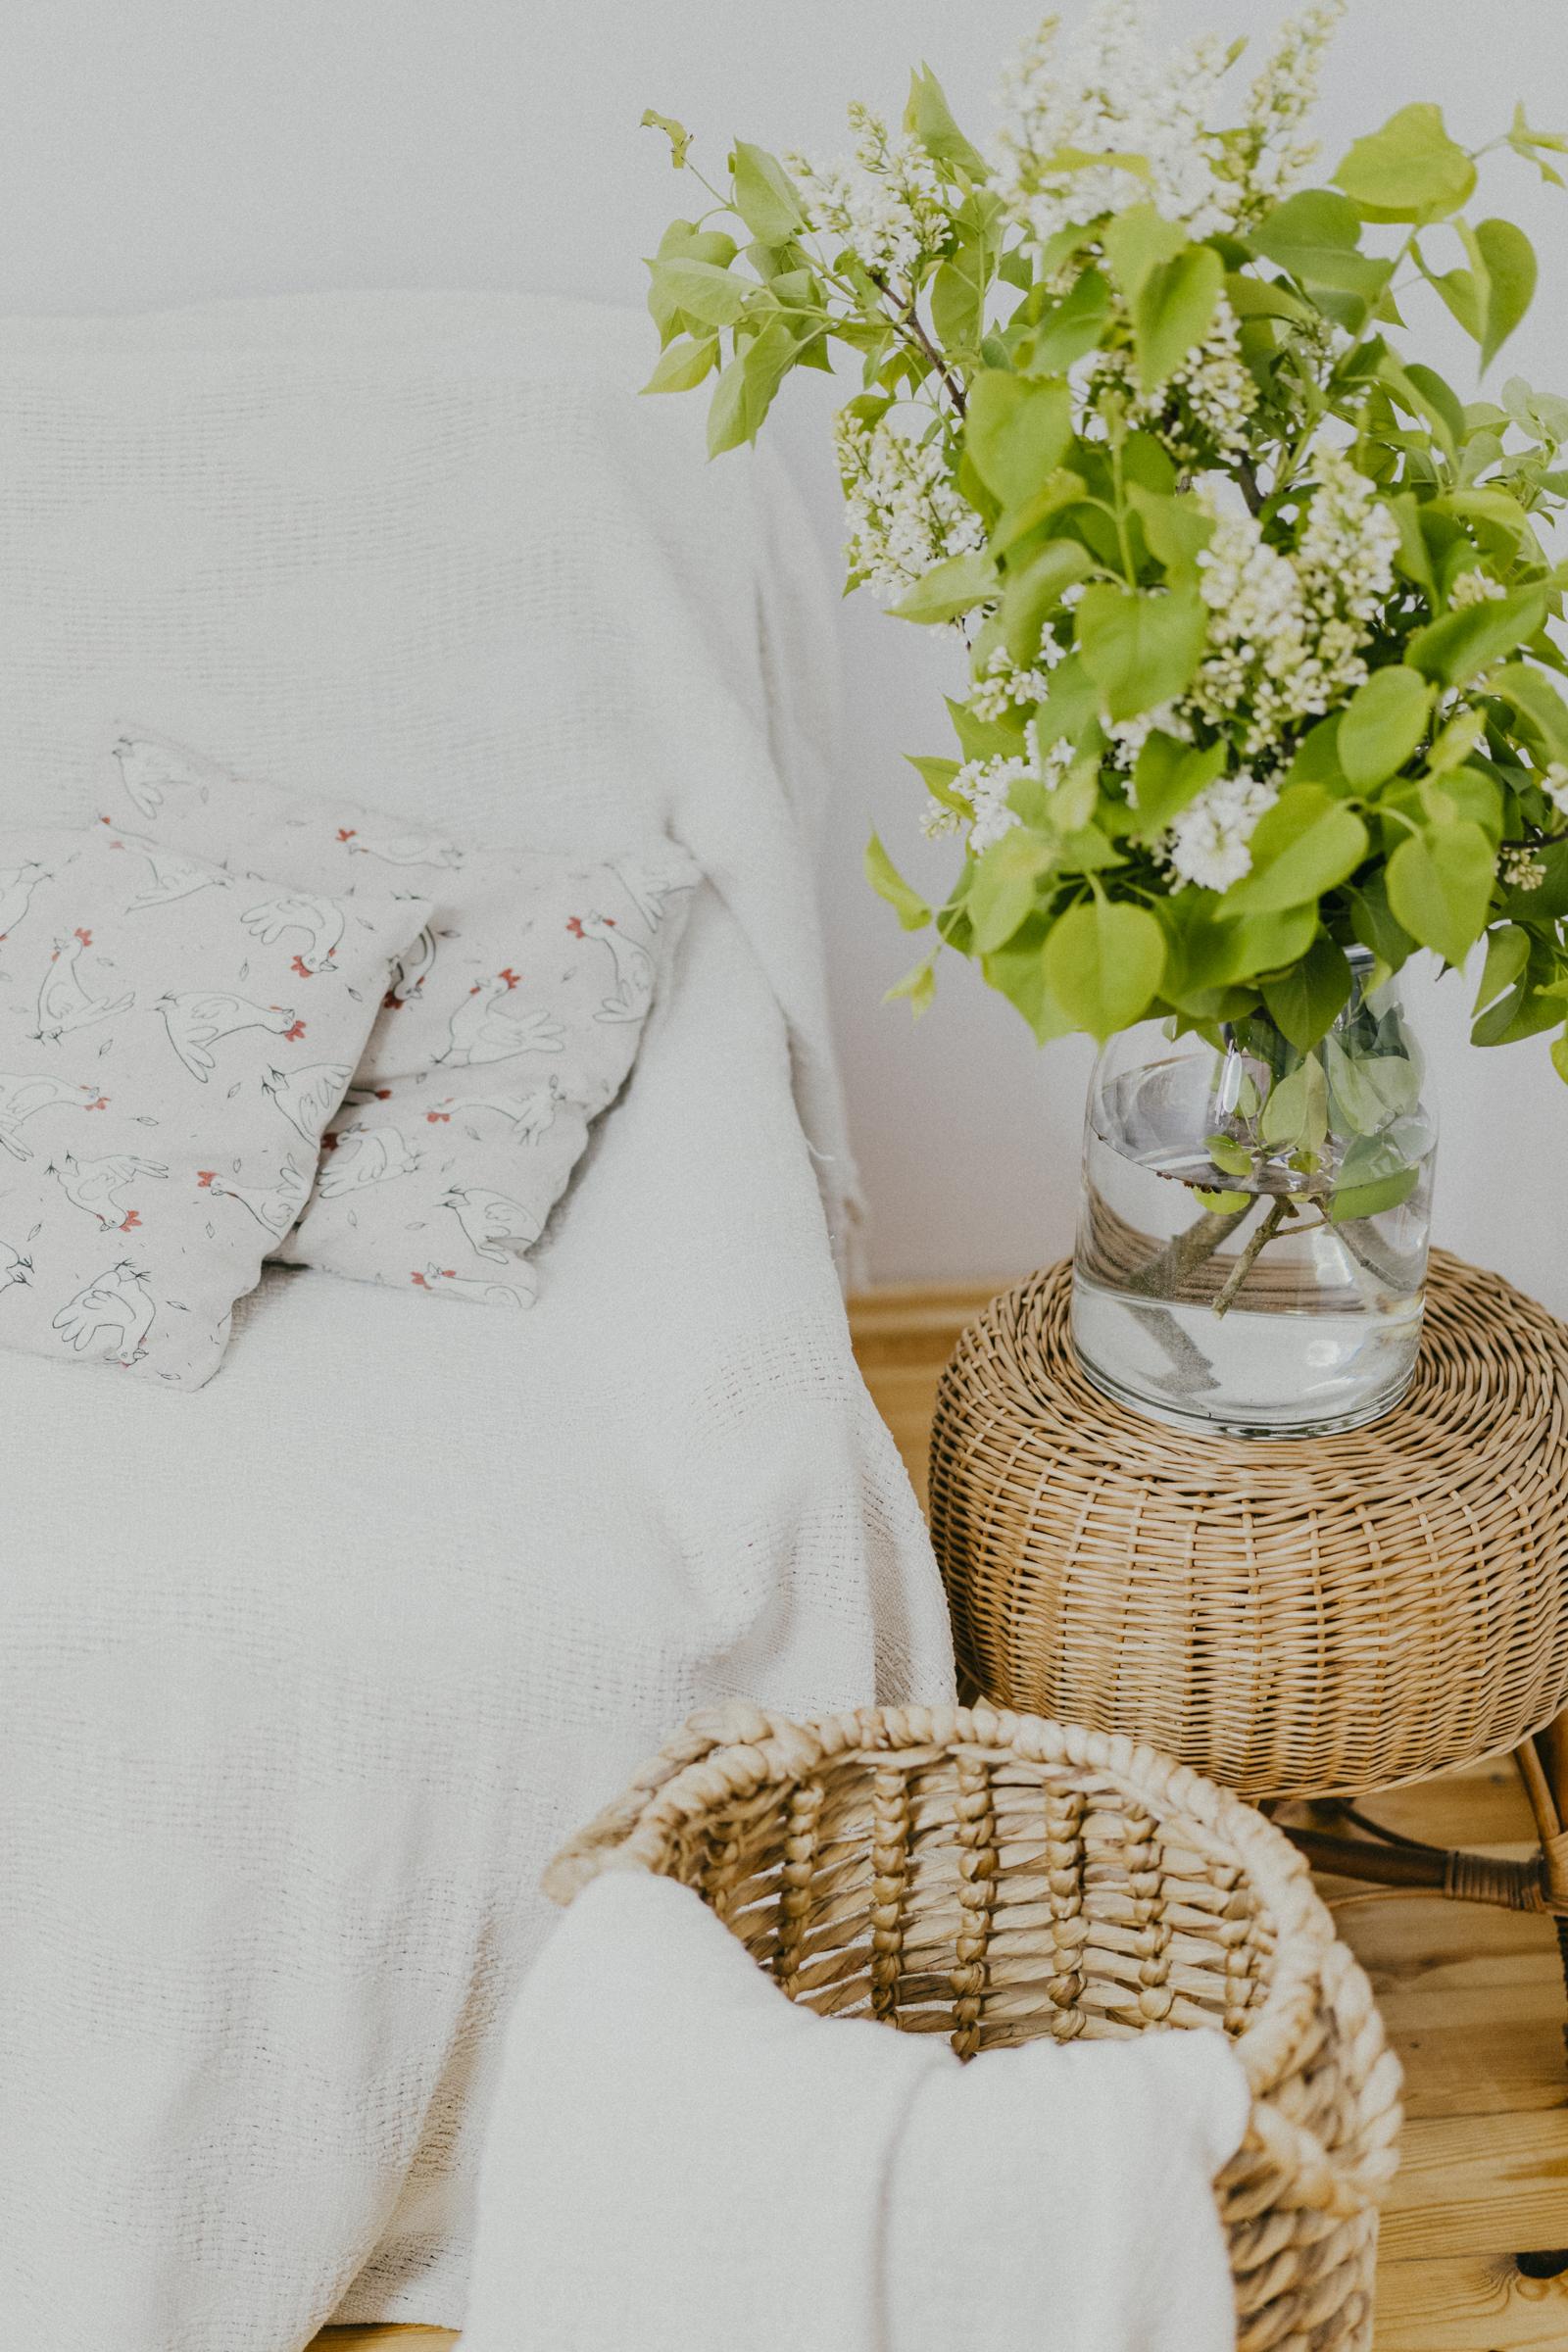 Plattówka - Domek z Kurnika - Where will I sleep?